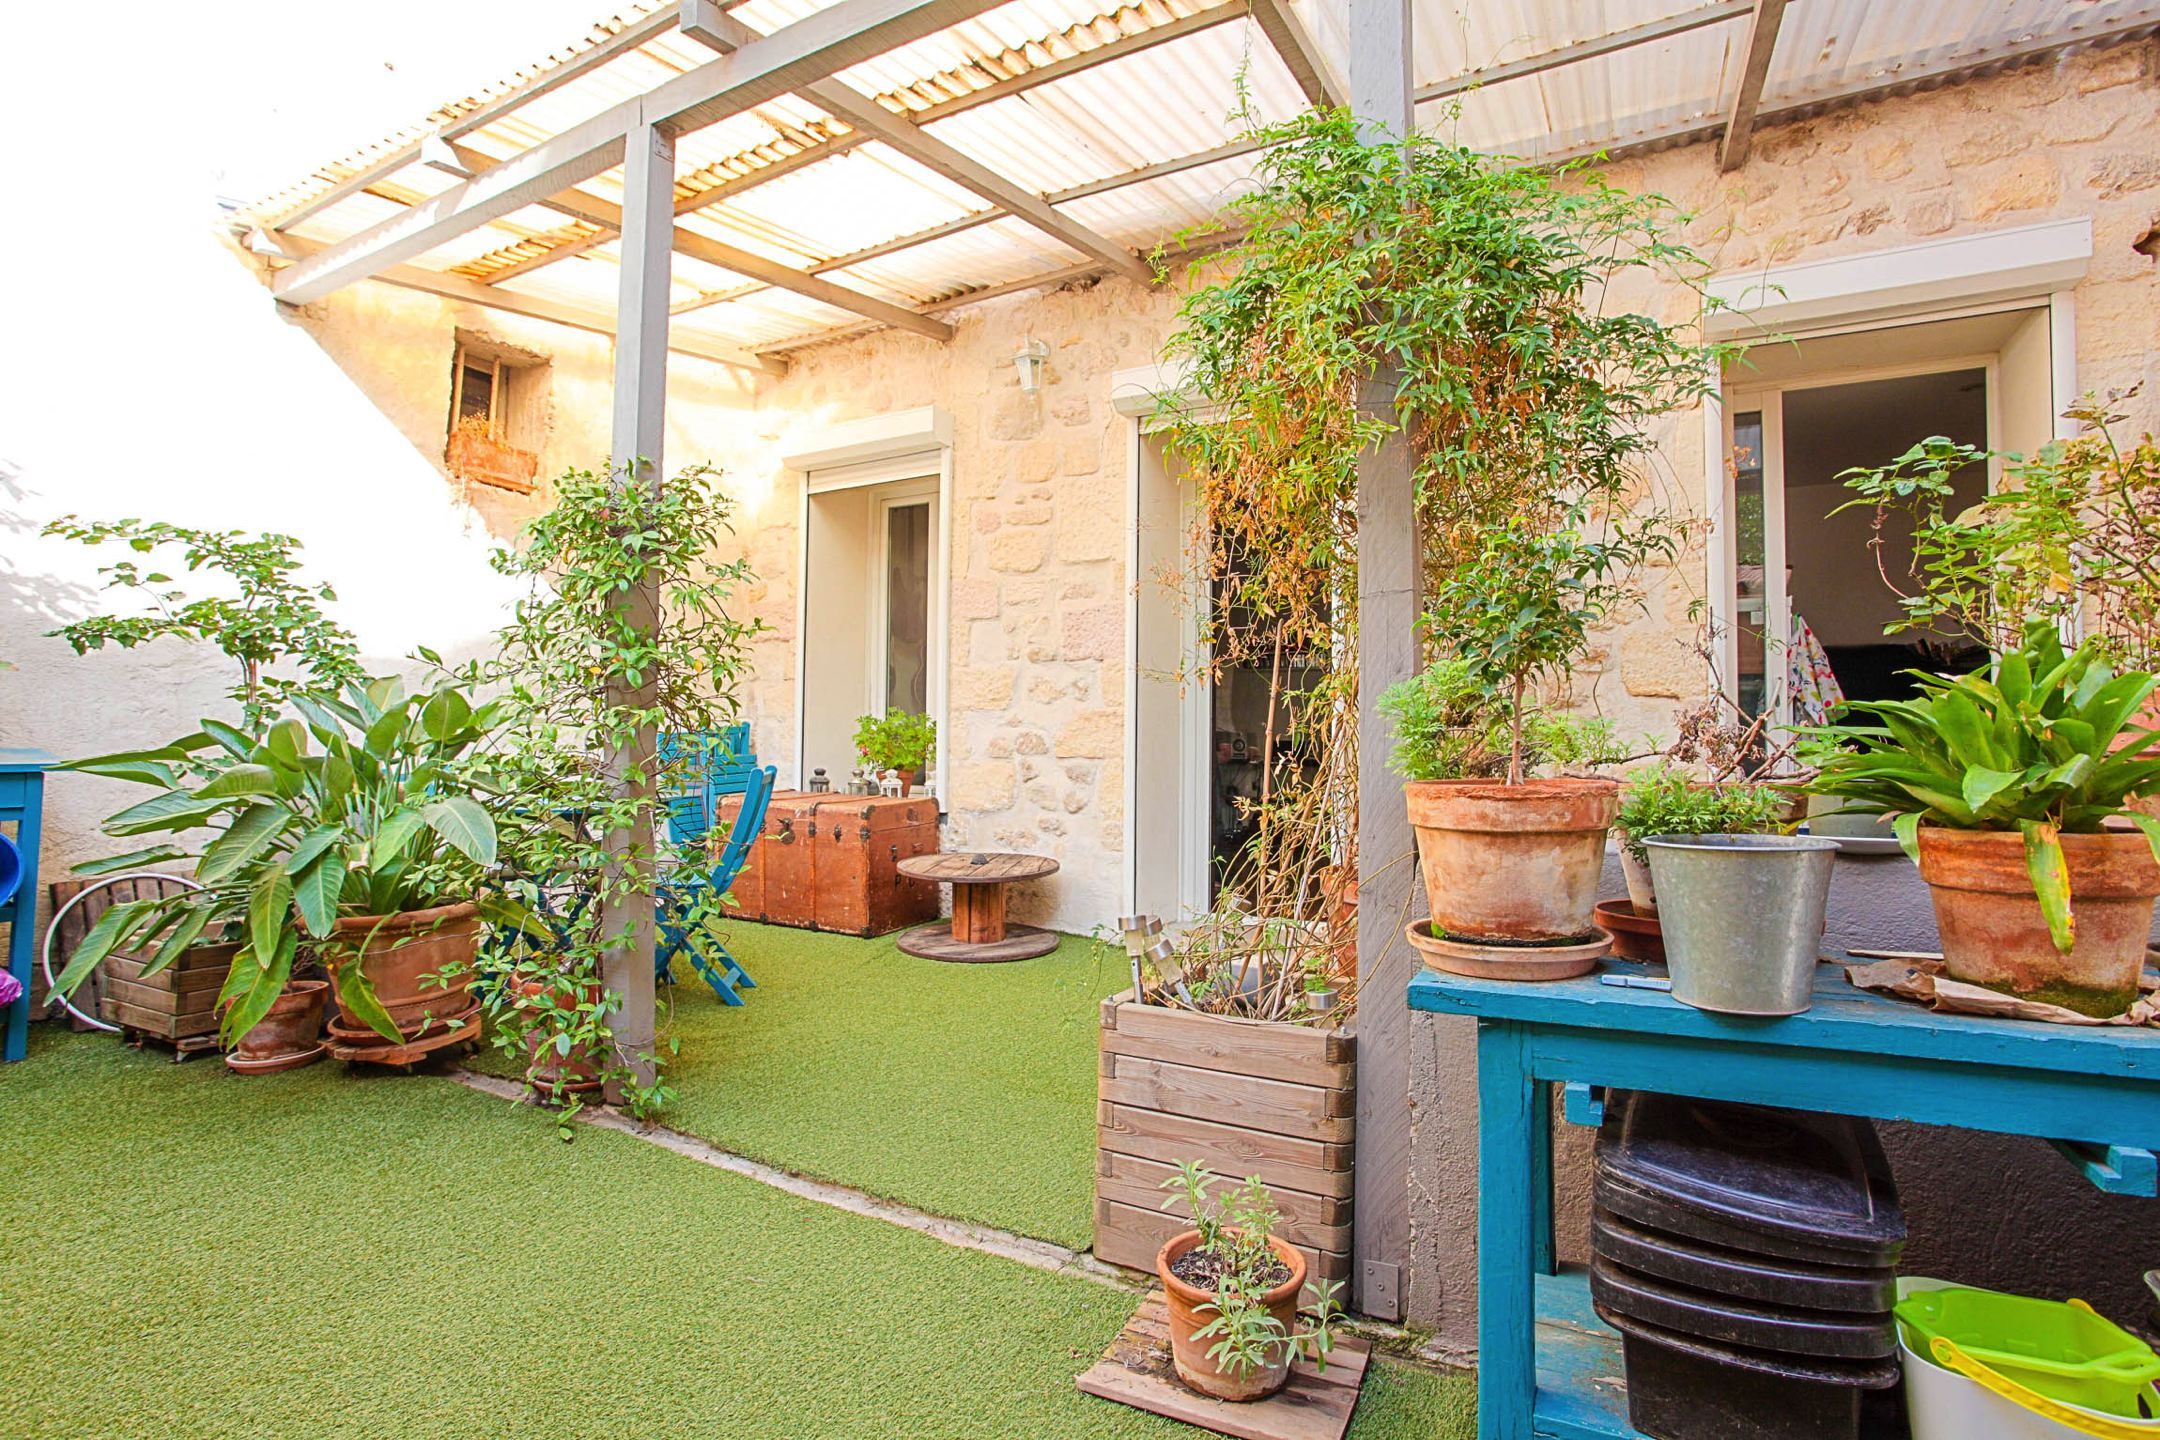 Rez de jardin t3 chave ma terrasse marseille - Terrasse jardin londrina quadra marseille ...